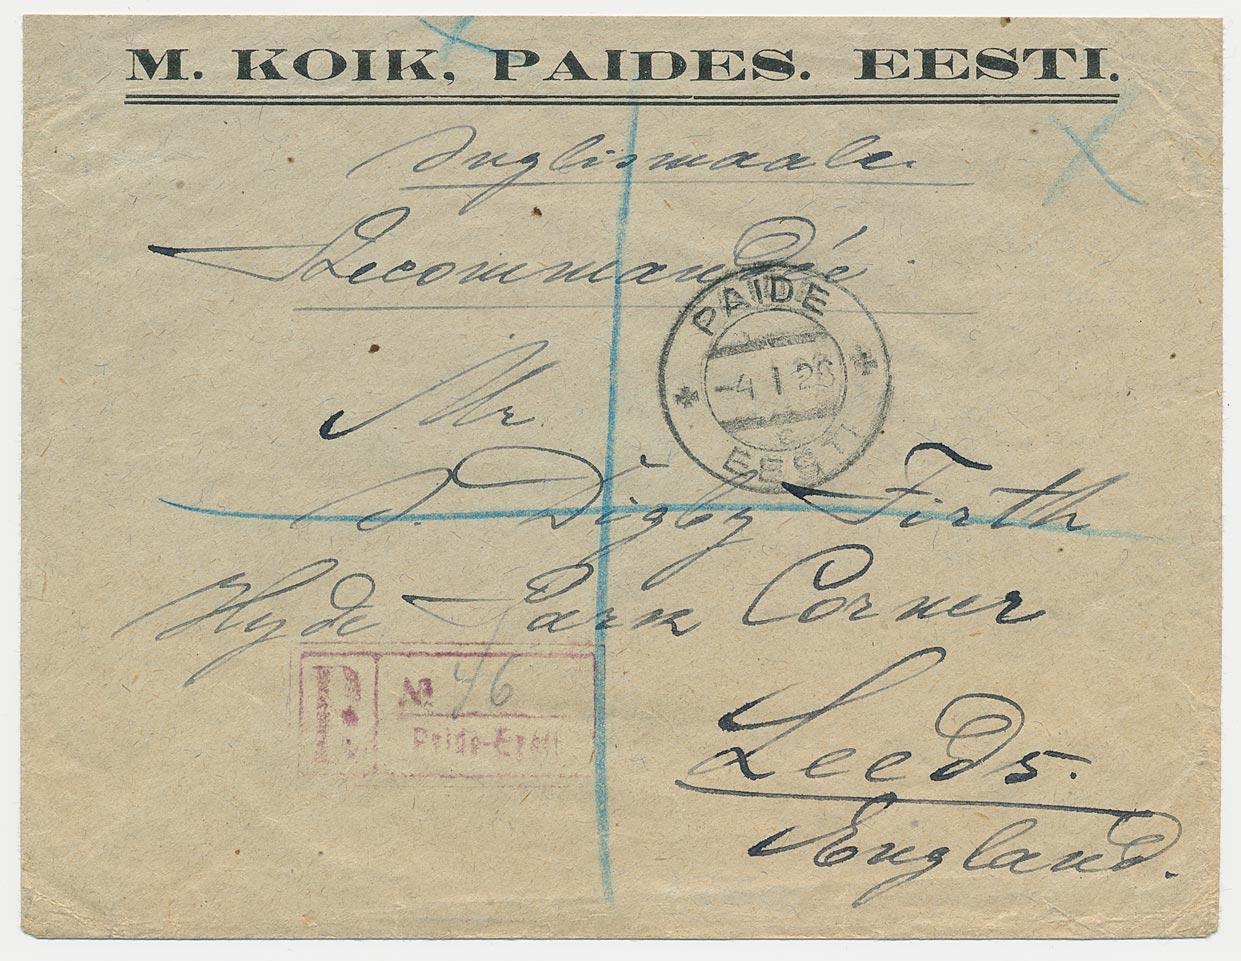 0257a-Koik-Paide-Leeds-1926